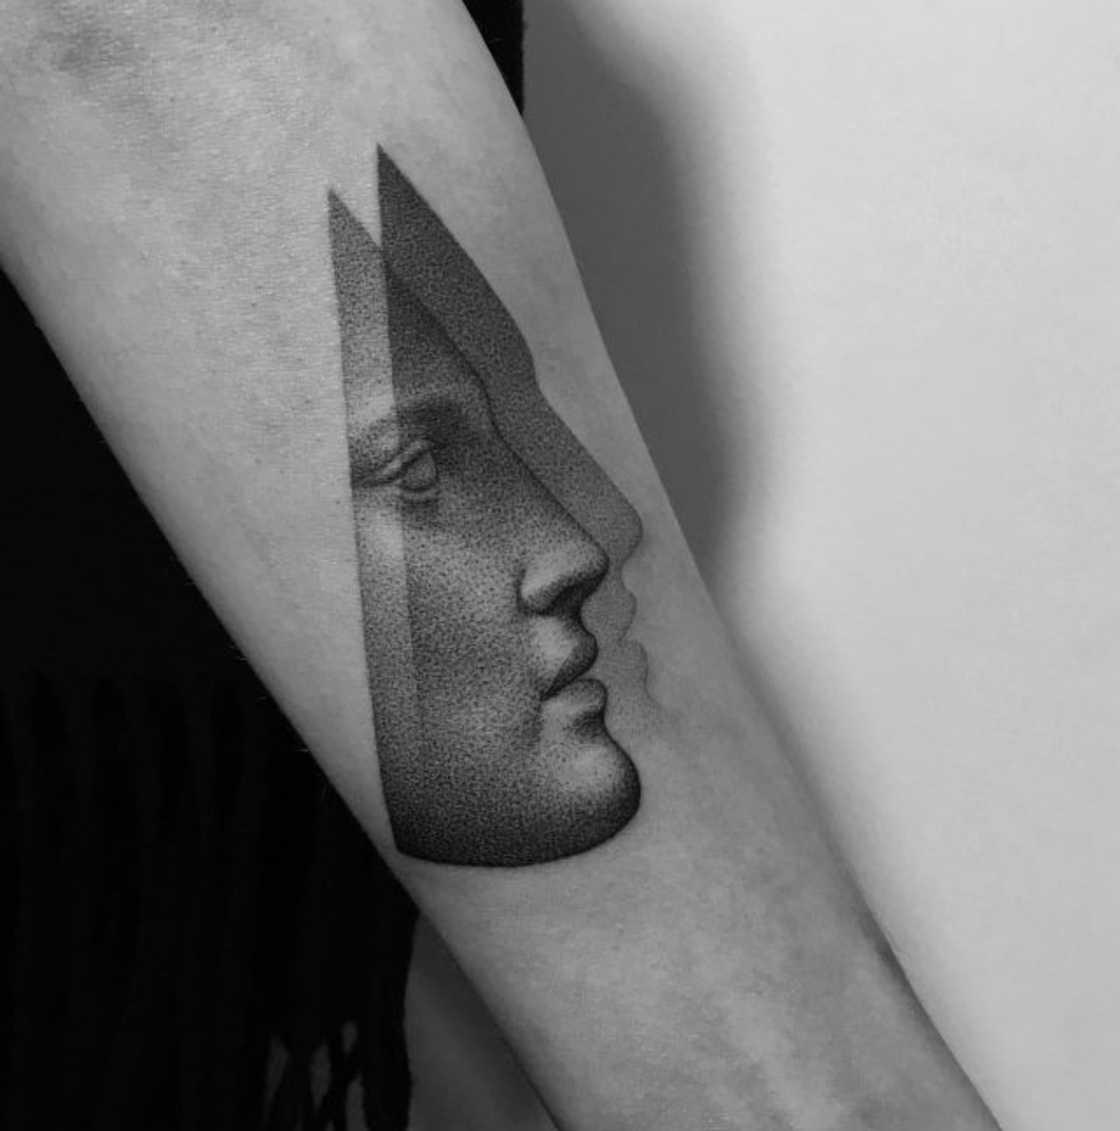 dotyk-dotwork-tattoo-25